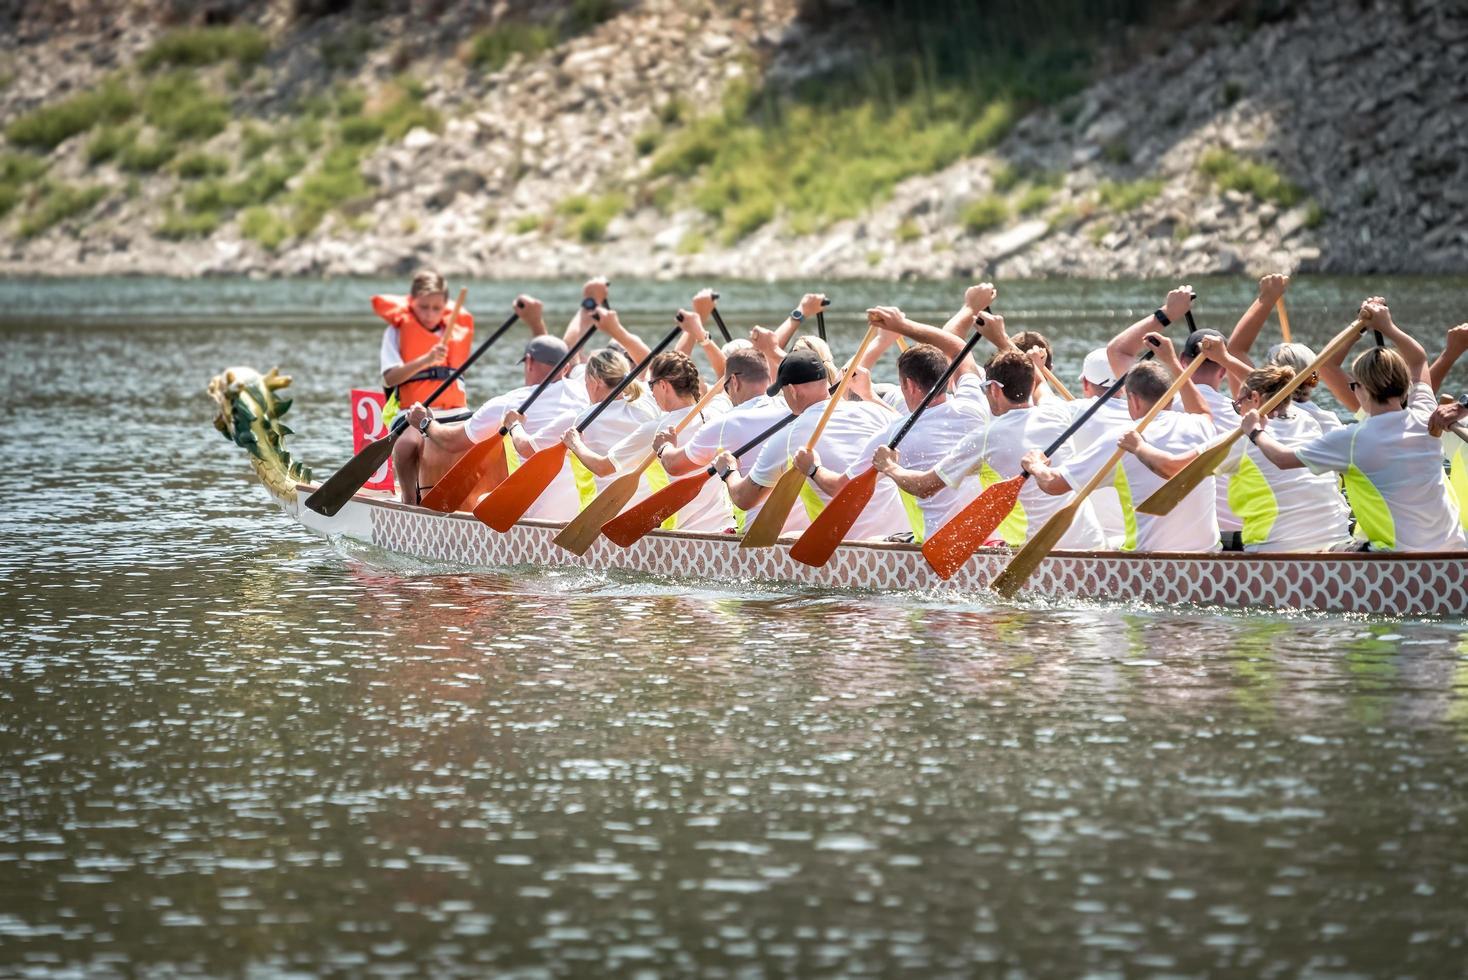 2018 - Chinees Dragon Boat Race-team foto